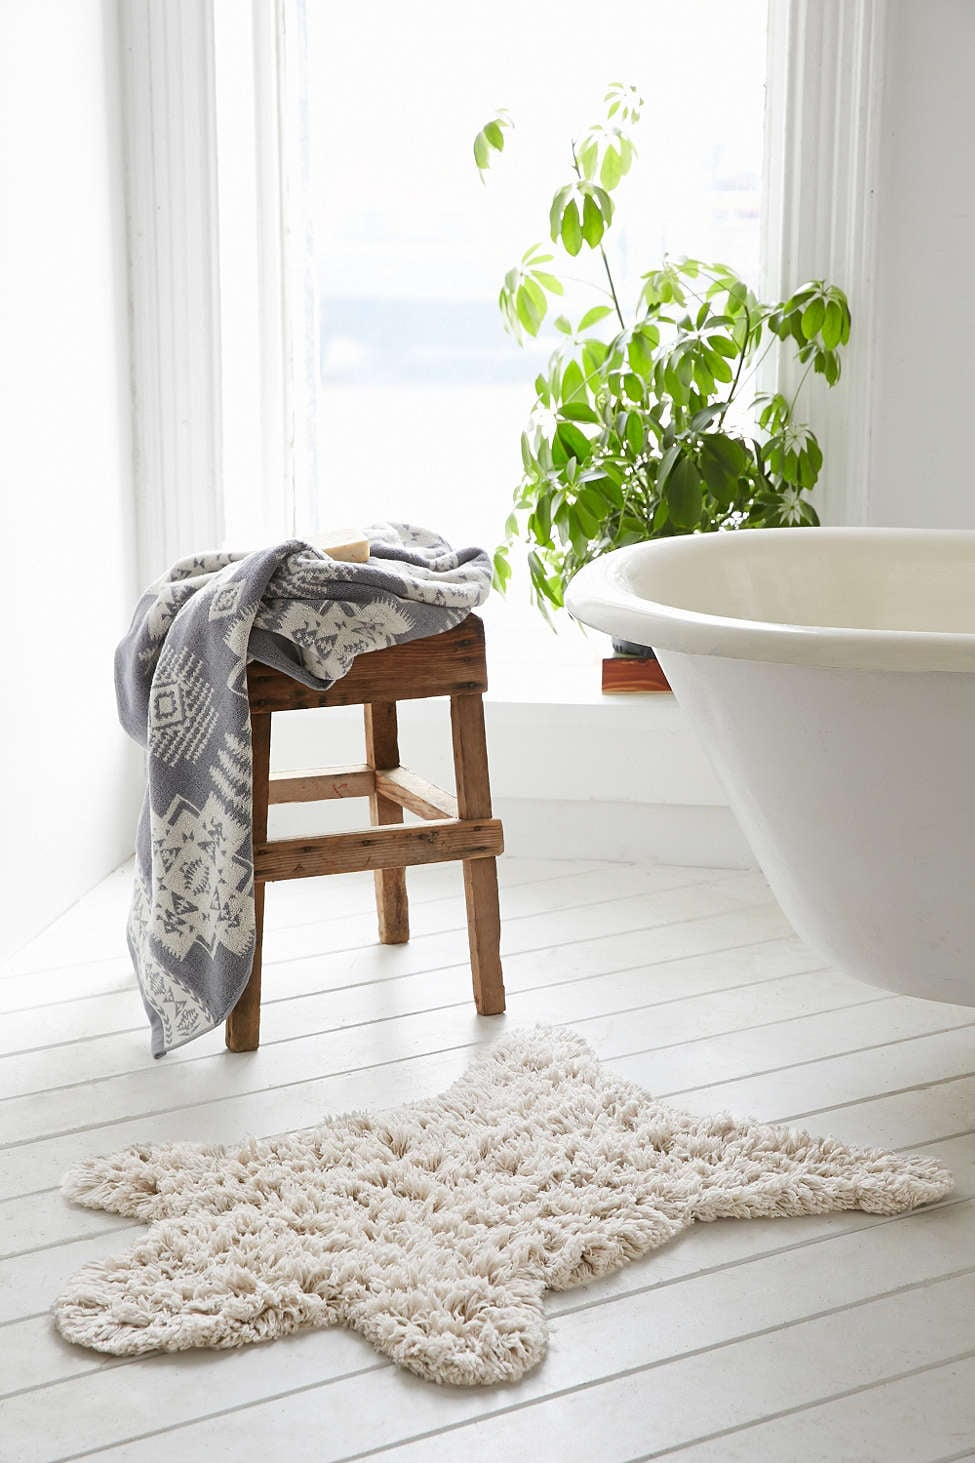 Bathroom: Switch Up Your Bath Mat